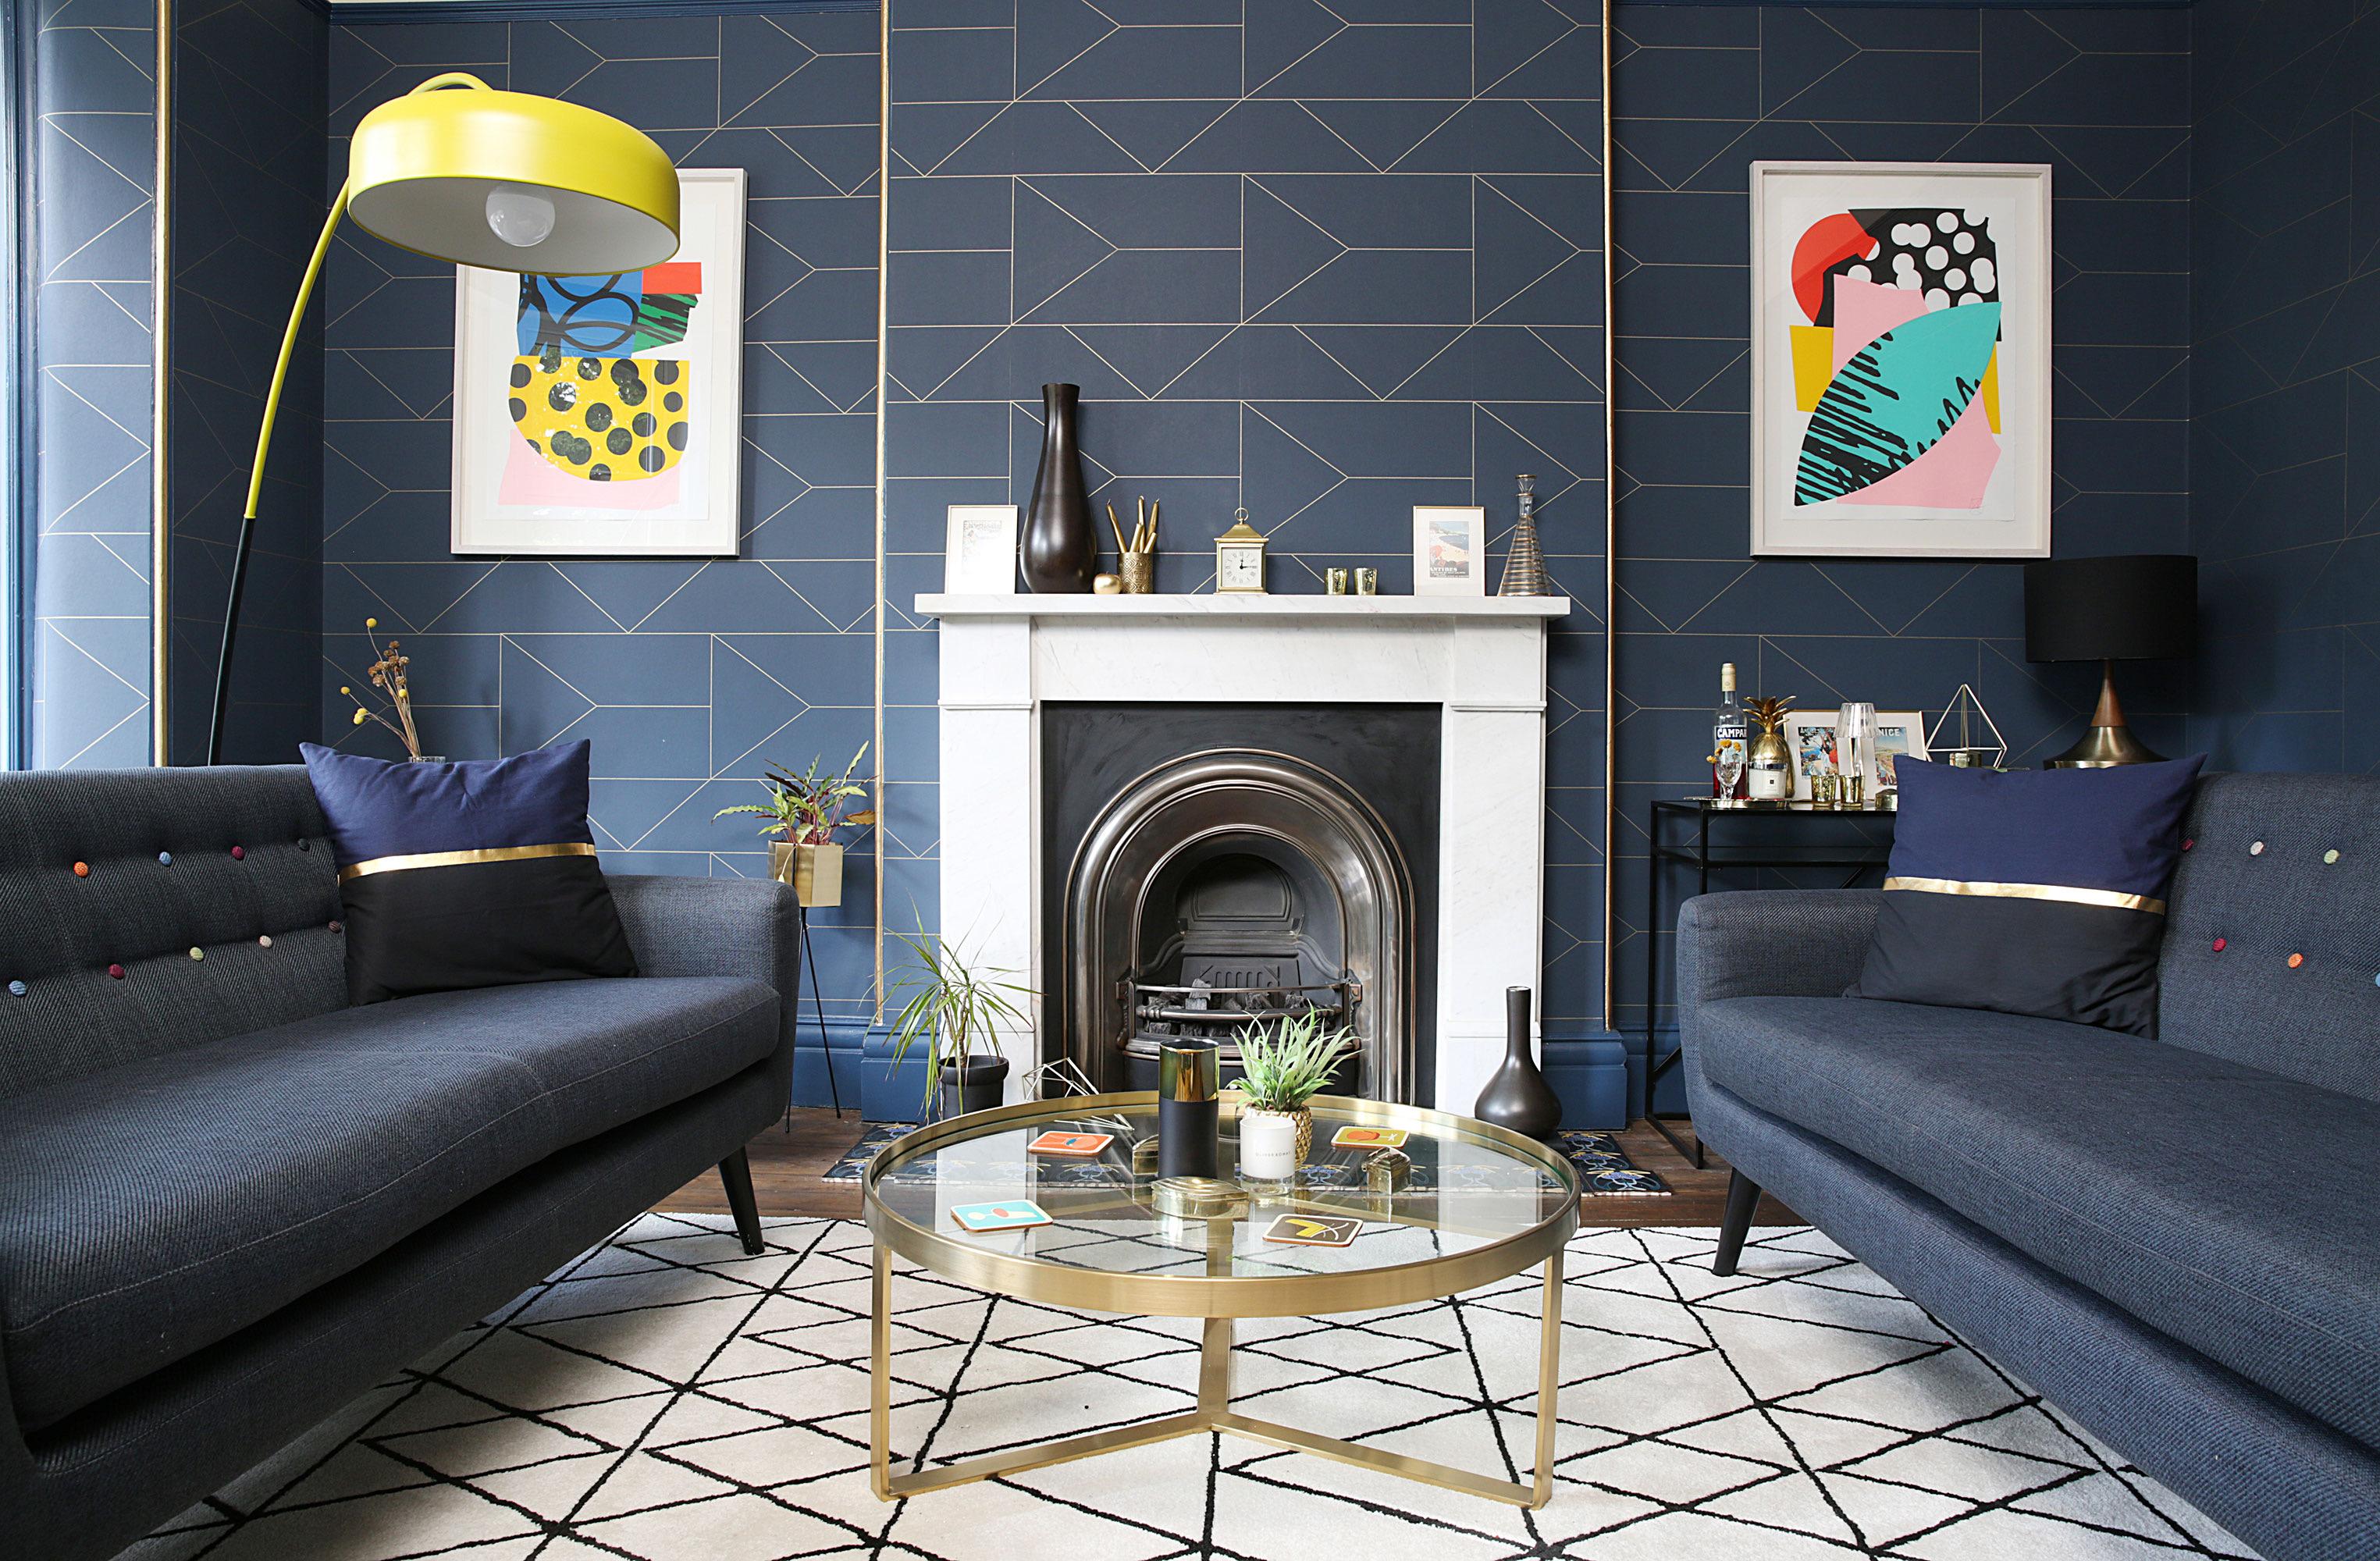 Interior Design Harrogate - Image by Katie Lee